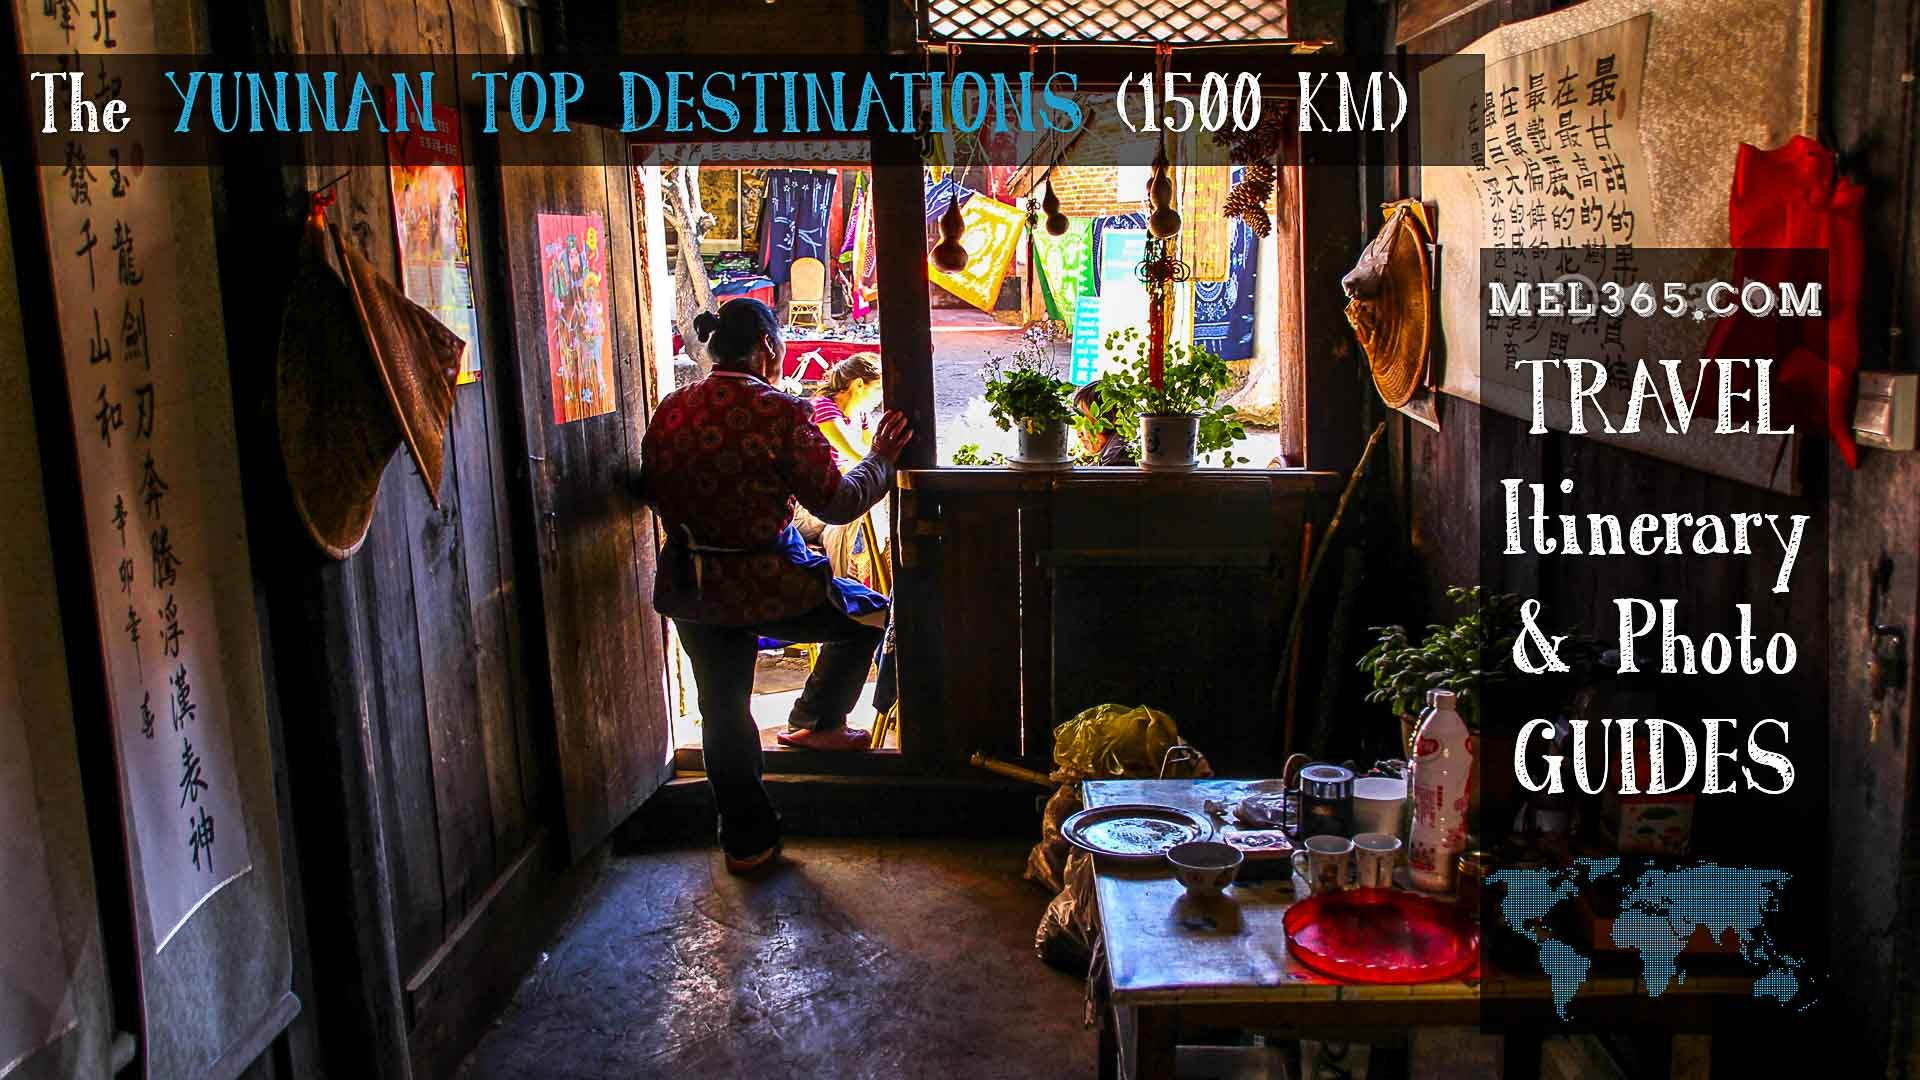 Itinerary – Yunnan top destinations - MEL365.com - Travel & Photography